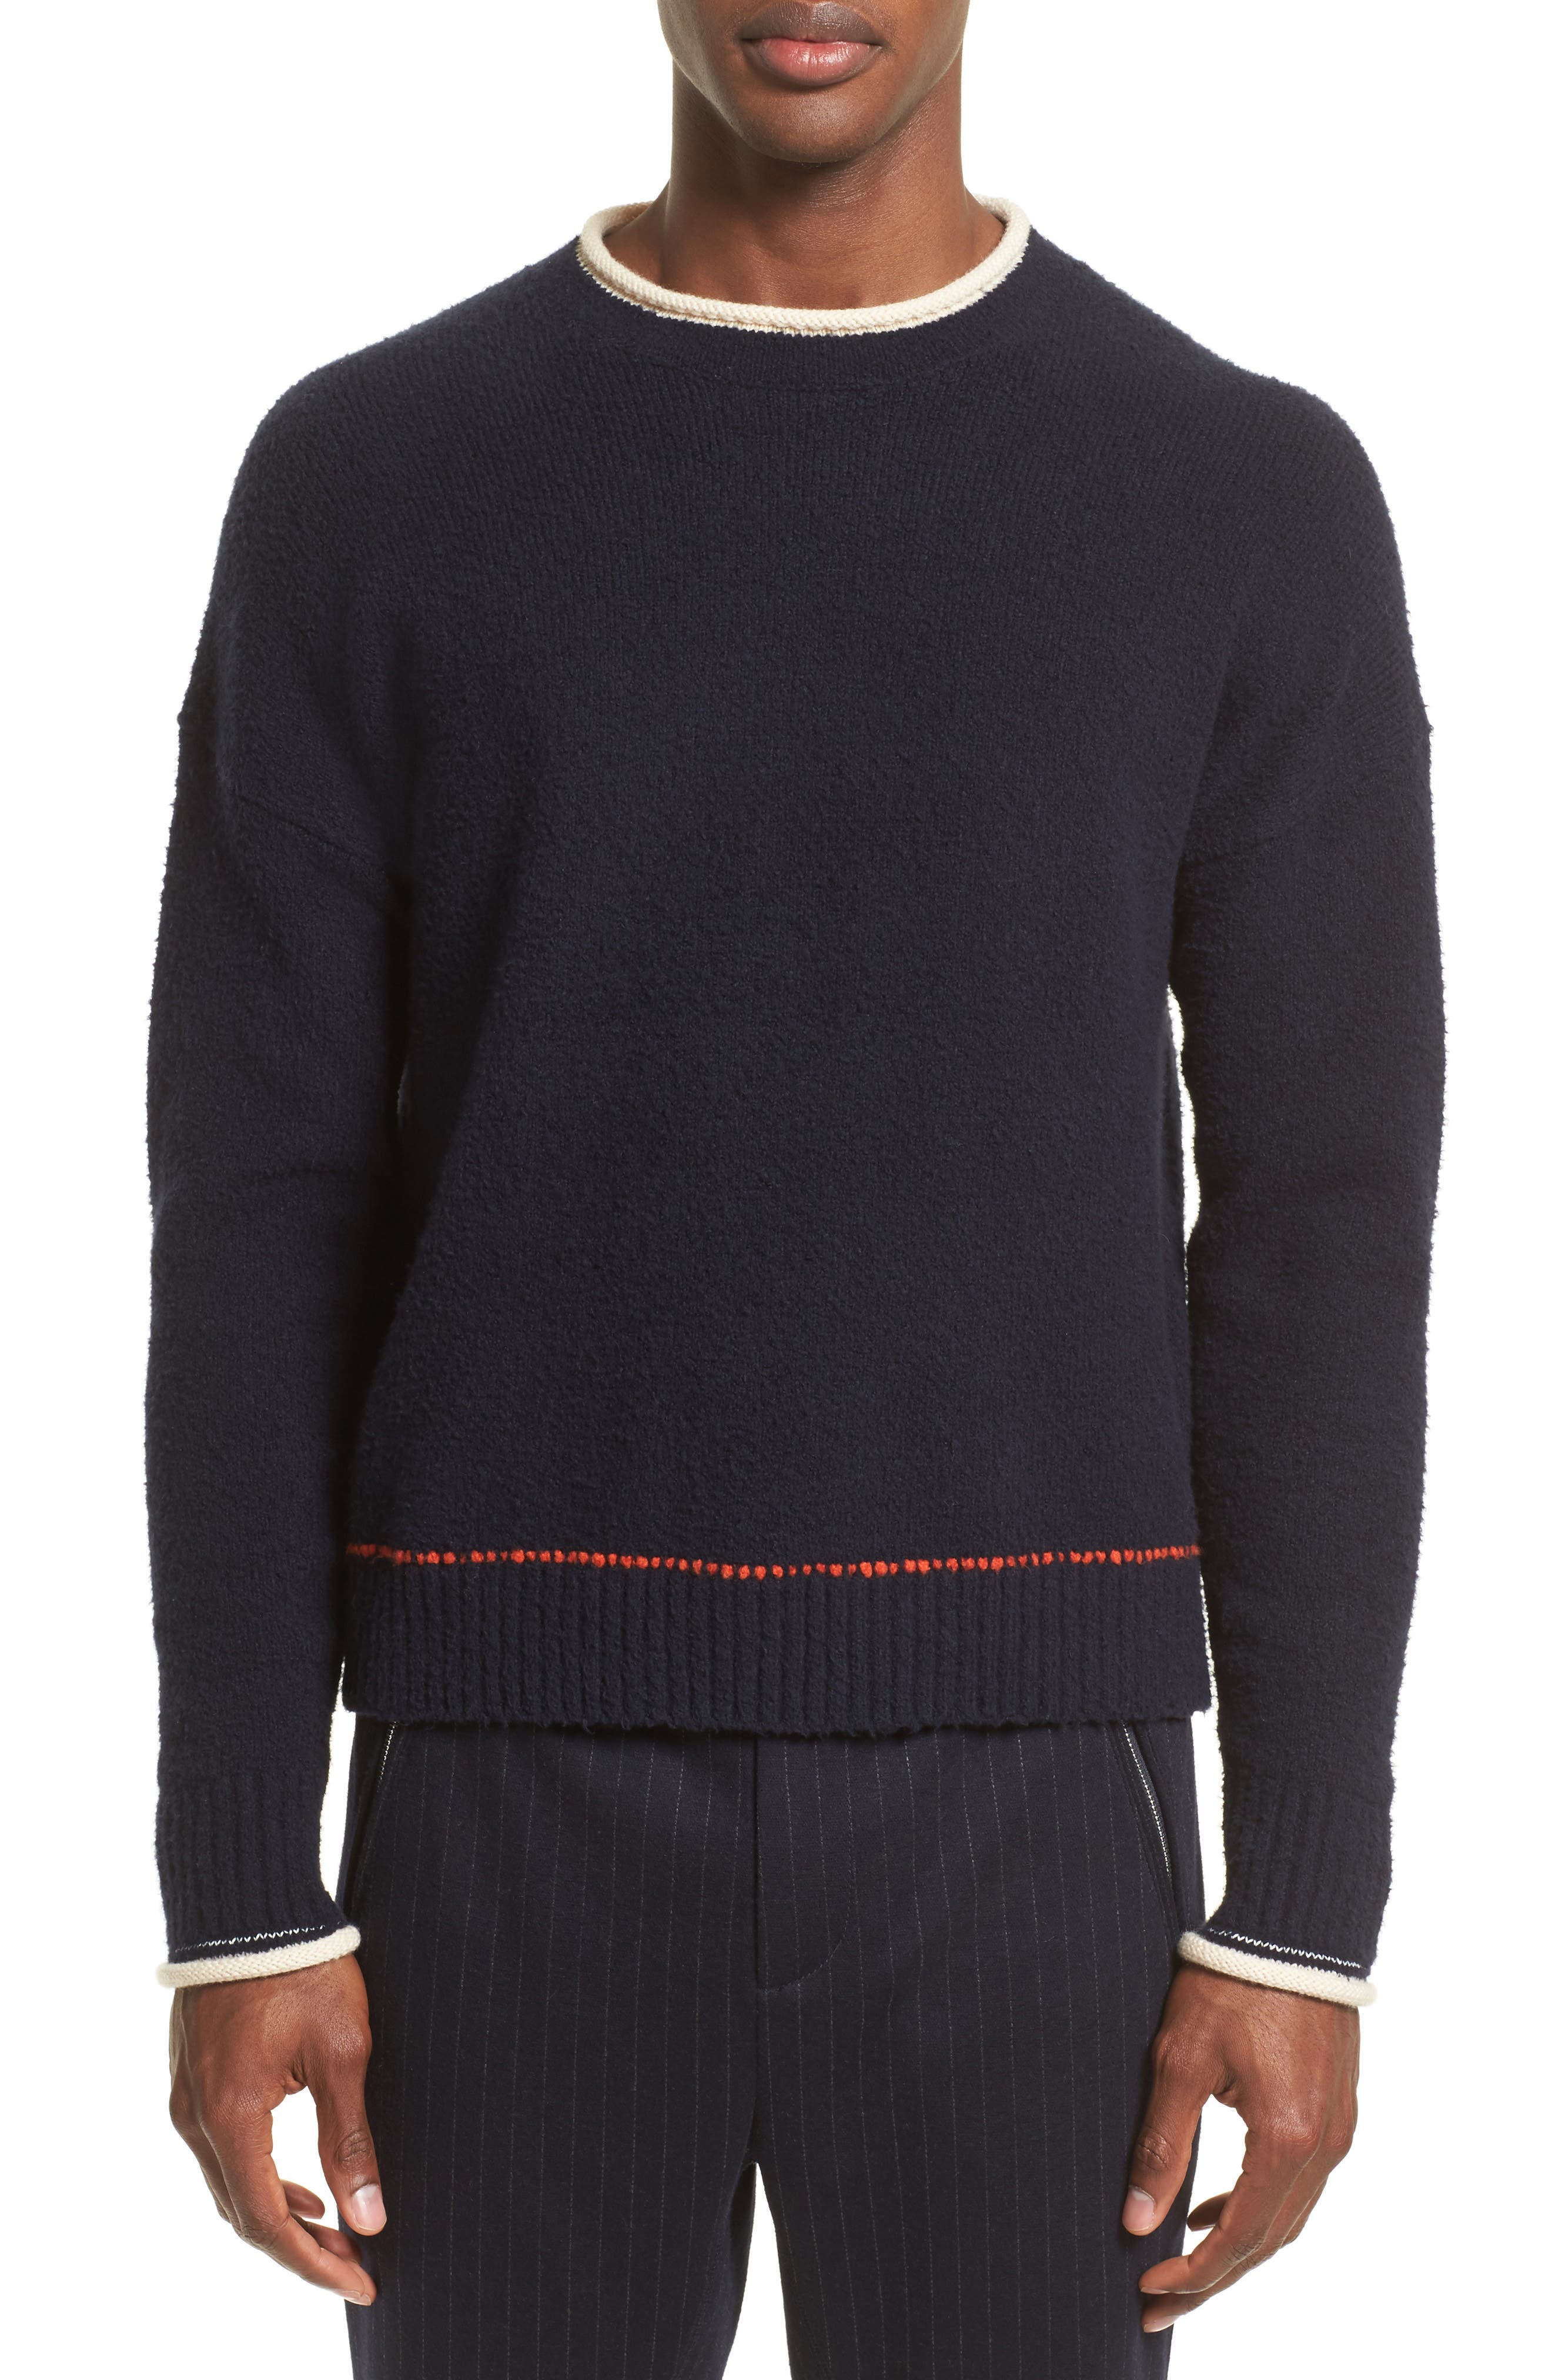 Main Image - 3.1 Phillip Lim Plaited Sweater